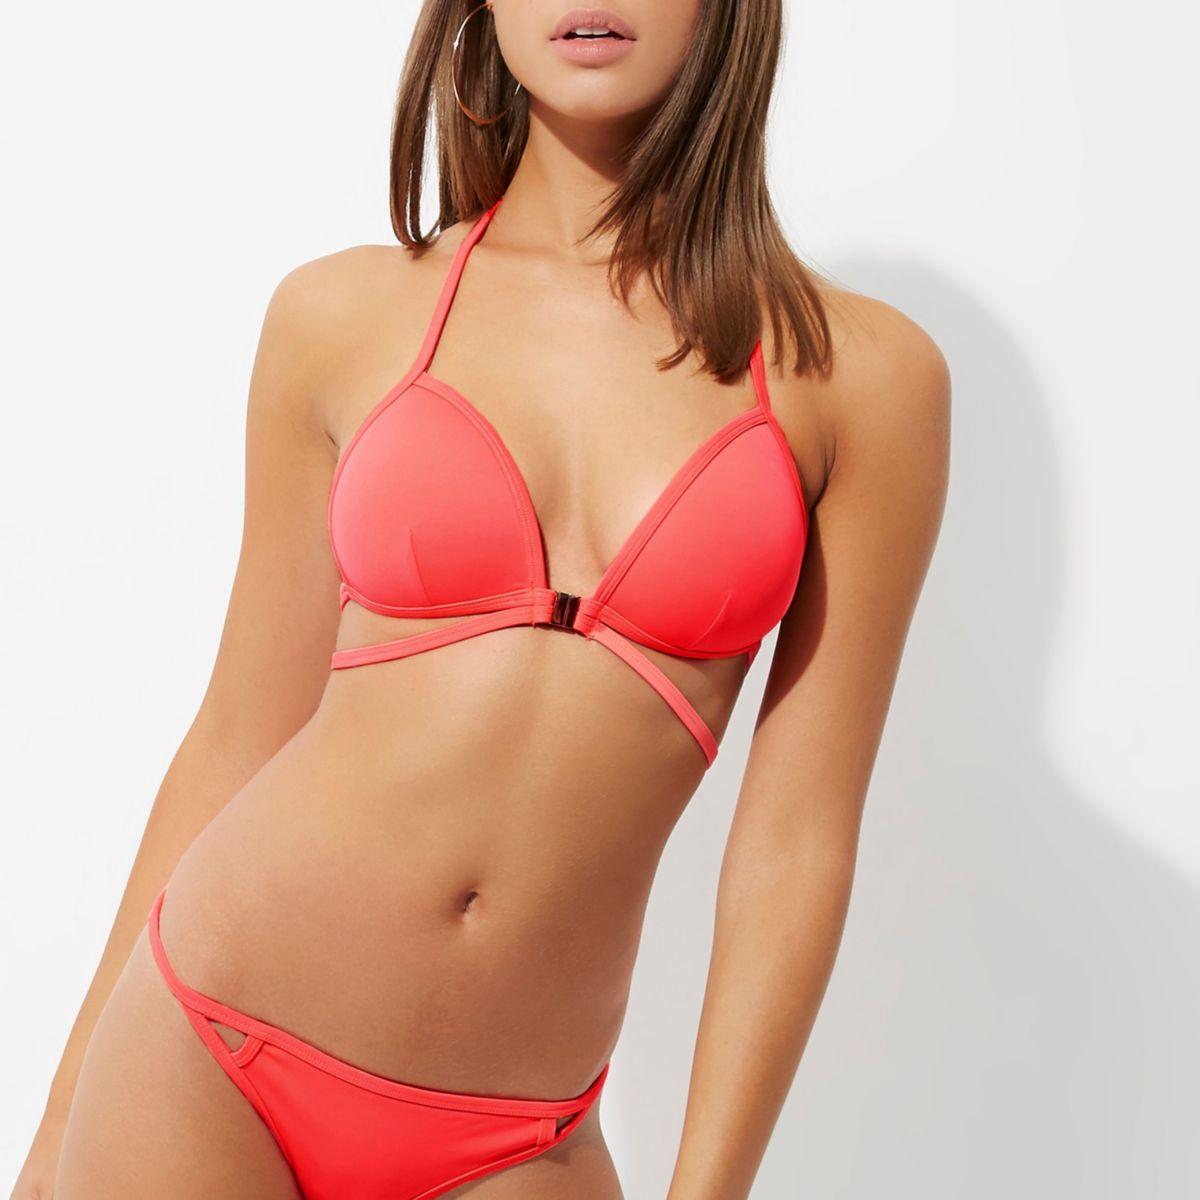 Haut de bikini triangle rose à lanières